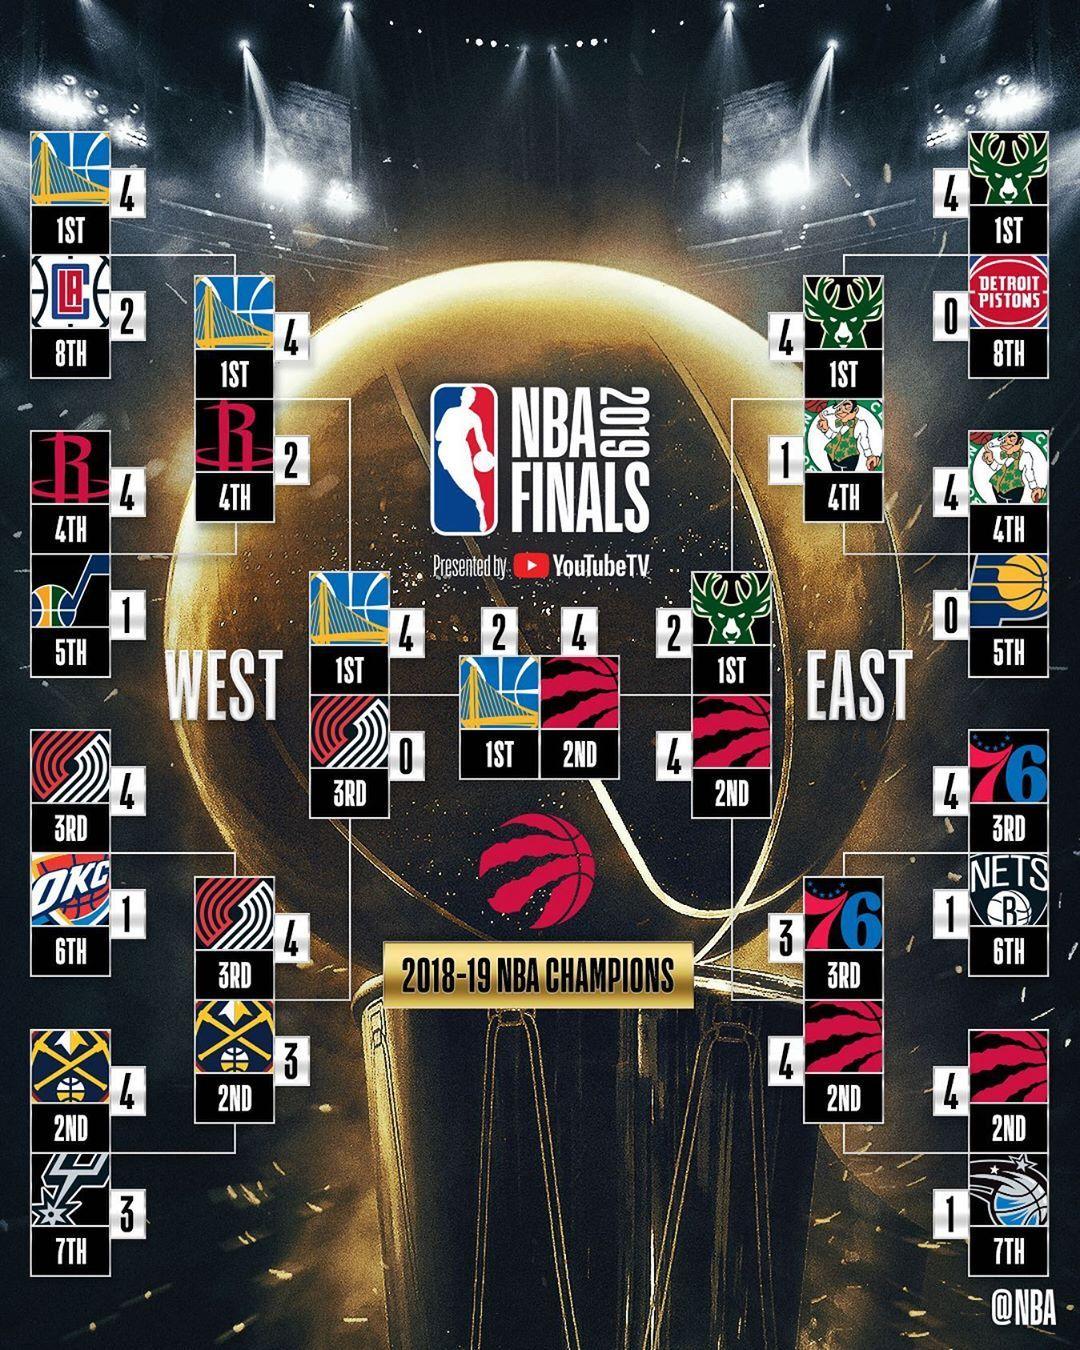 Nba Bracket Complete Basketball Big4 Bigfour Big4 Bigfour Big4 Bigfour Nationalbasketballassociation Raptors Basketball Nba Raptors